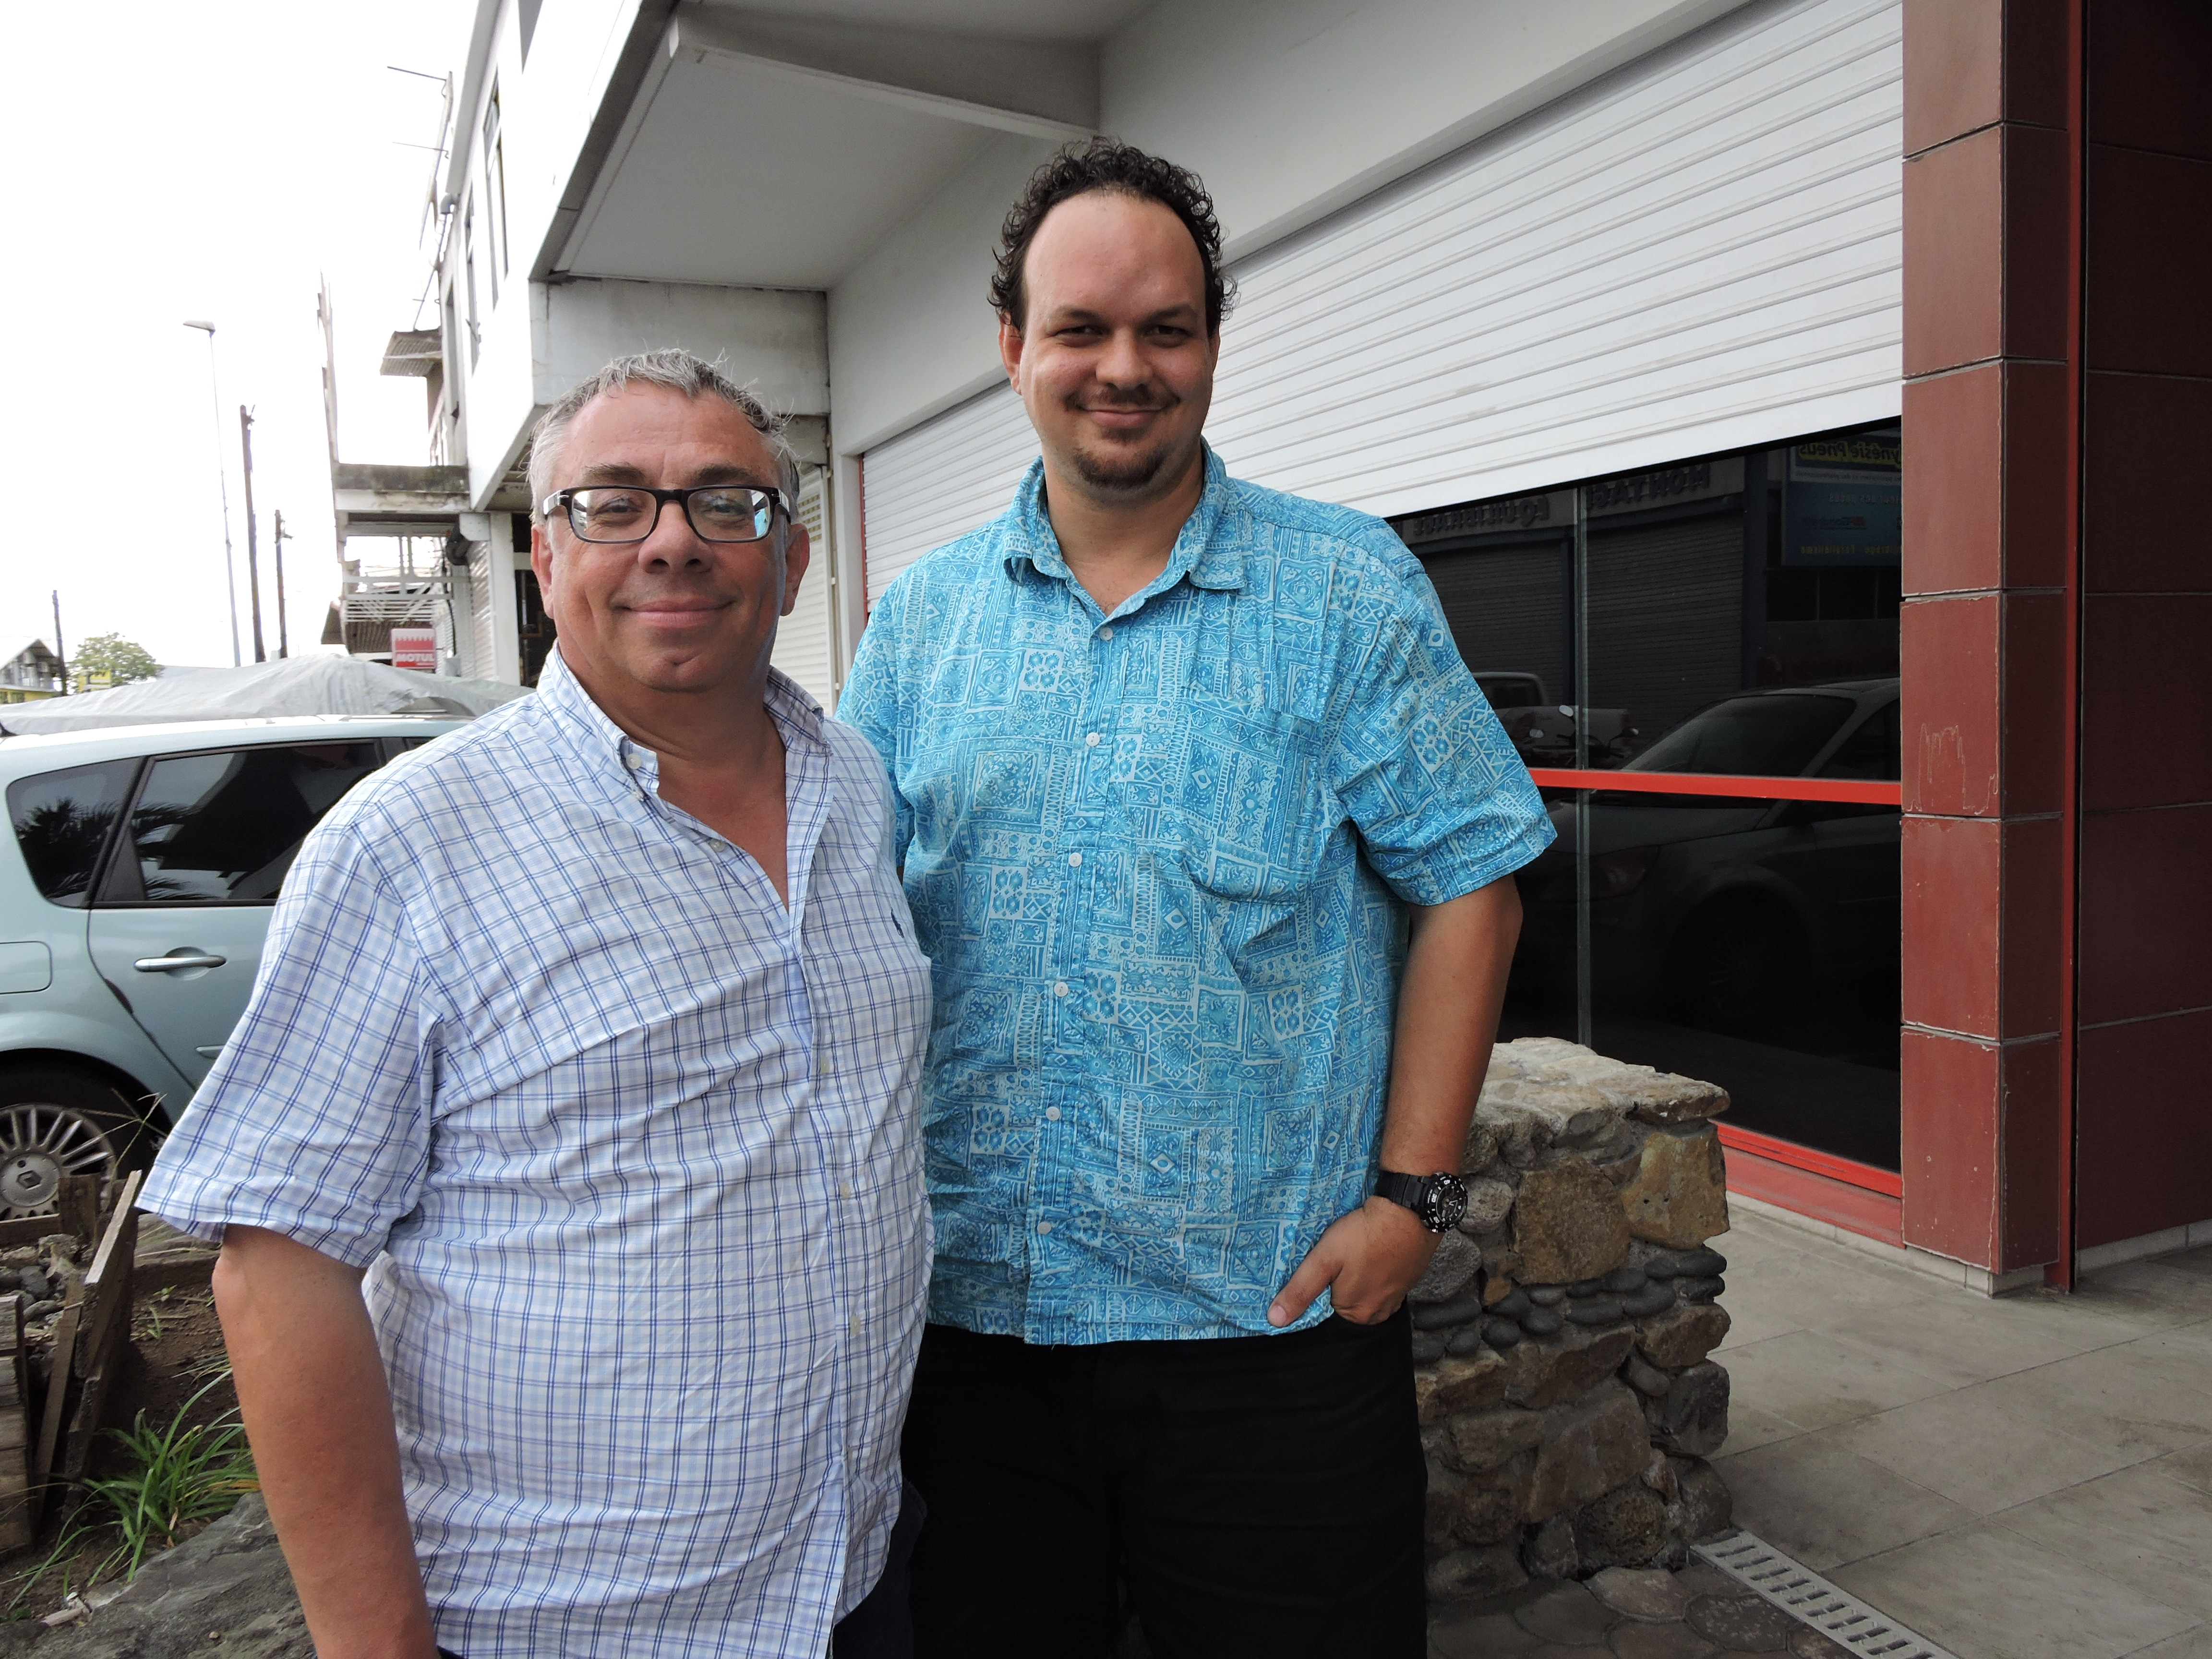 Christian Lage, secrétaire général du Snetaa-FO, et Maheanuu Routhier, secrétaire territorial adjoint de Snetaa-FO.